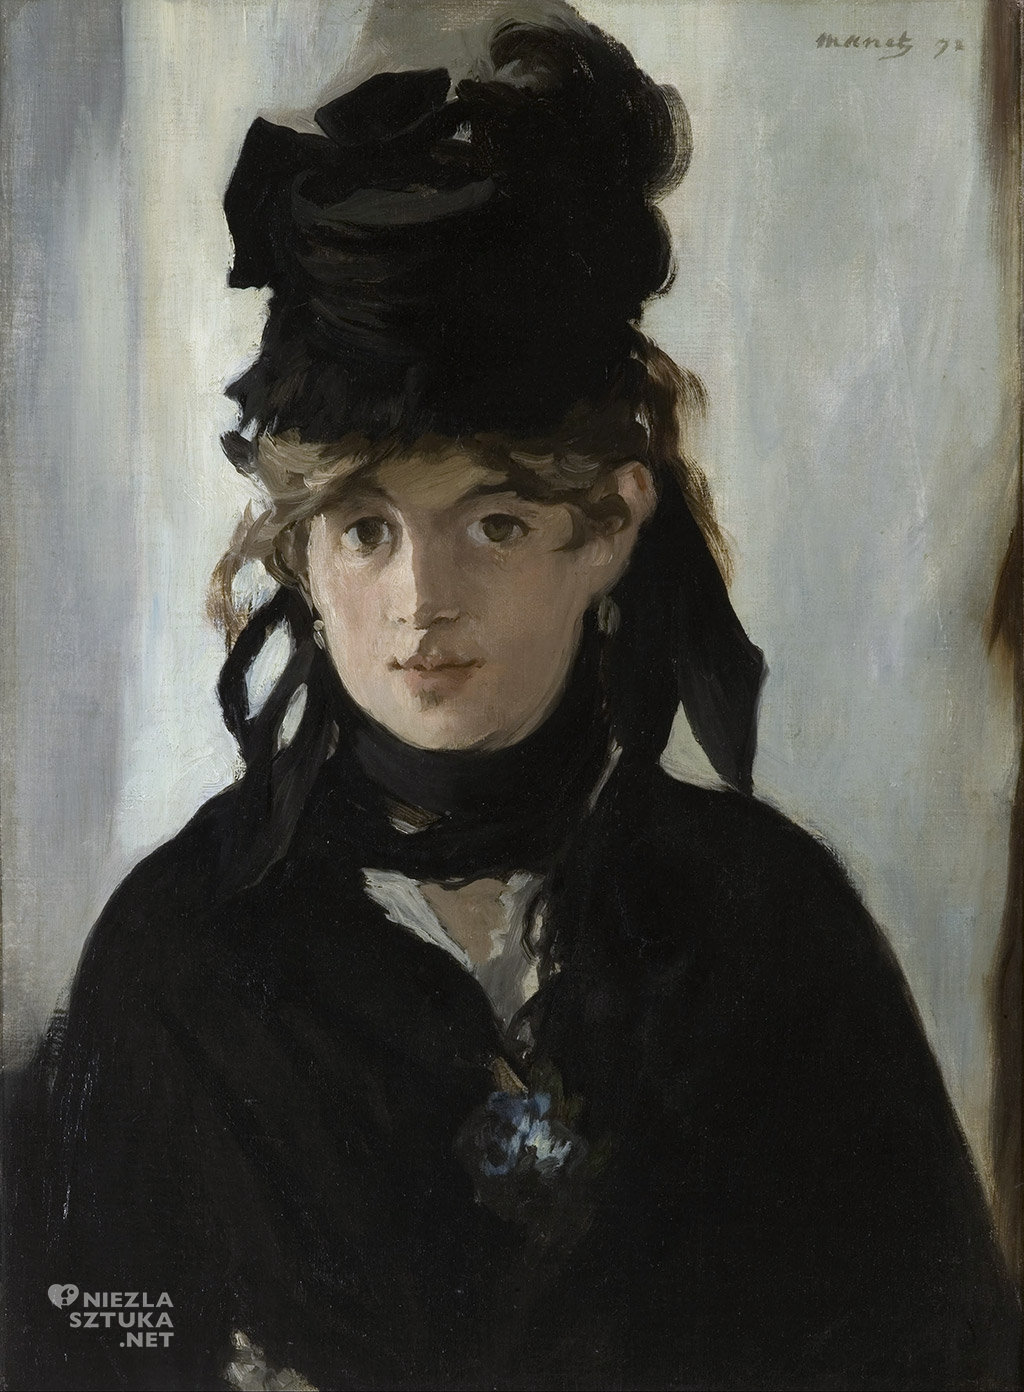 Edouard Manet Berthe Morisot z bukietem fiołków | 1872, Musée d'Orsay